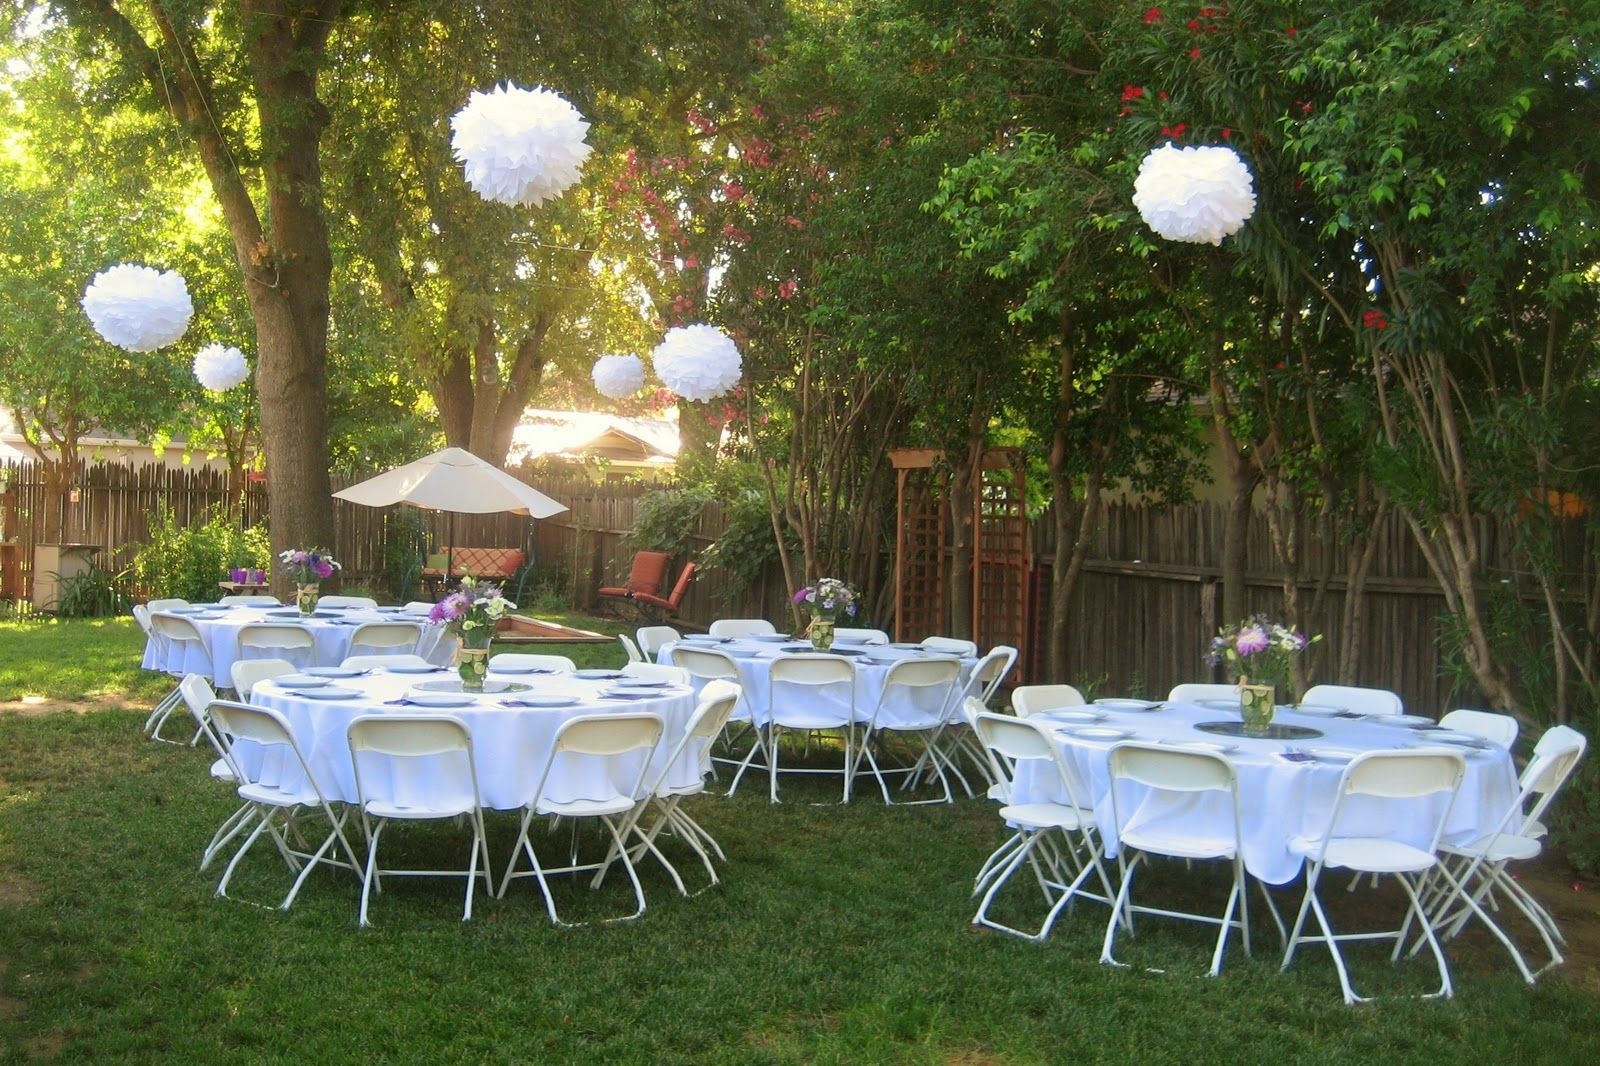 Beautiful Backyard Weddings Wedding Photos Great Party Decor Ideas Pinterest And